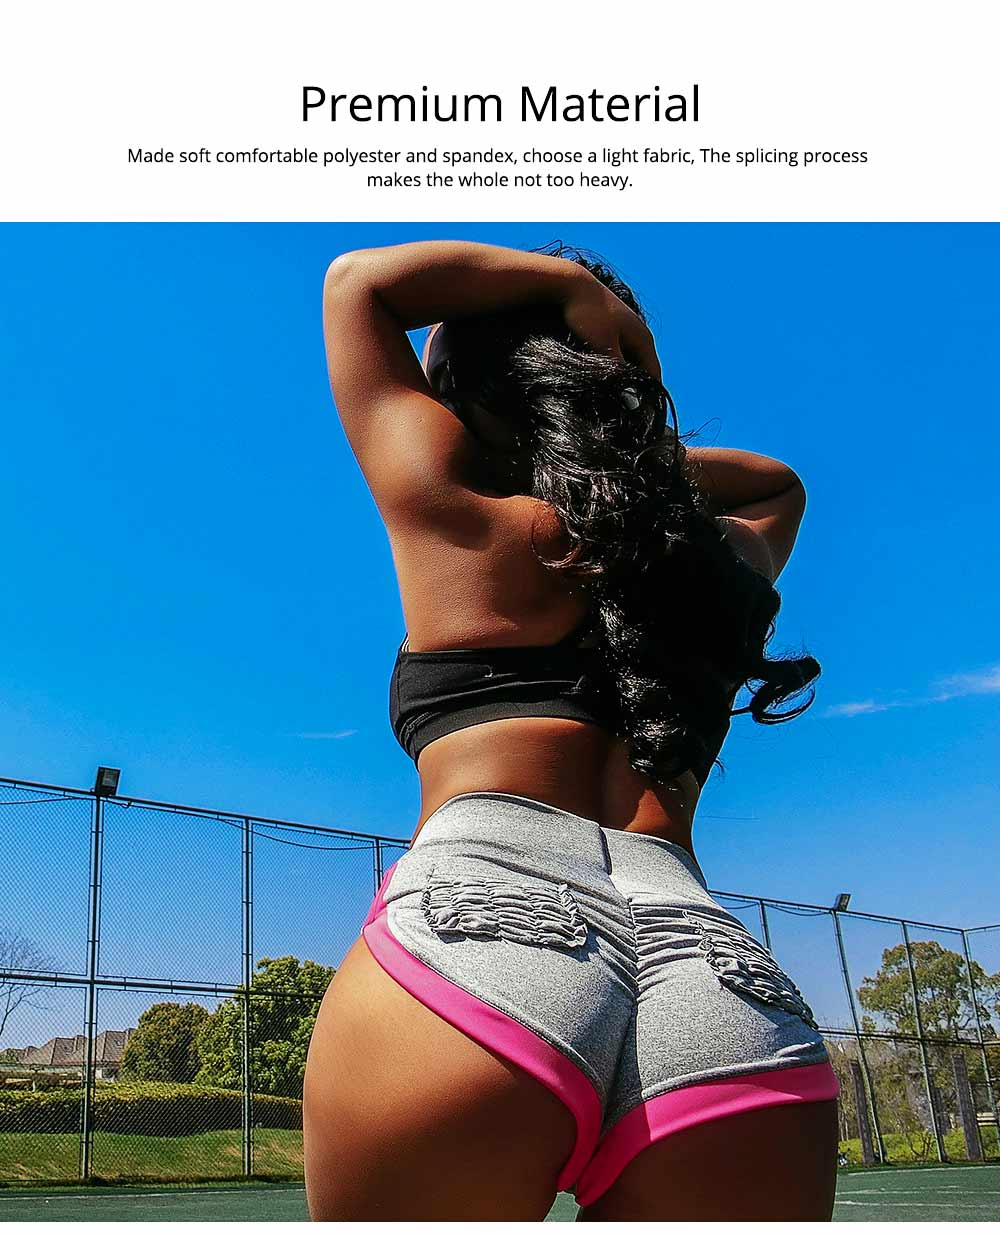 Women Workout Running Shorts Breathable Active Yoga Gym Sport Shorts Fashion Sportswear 3